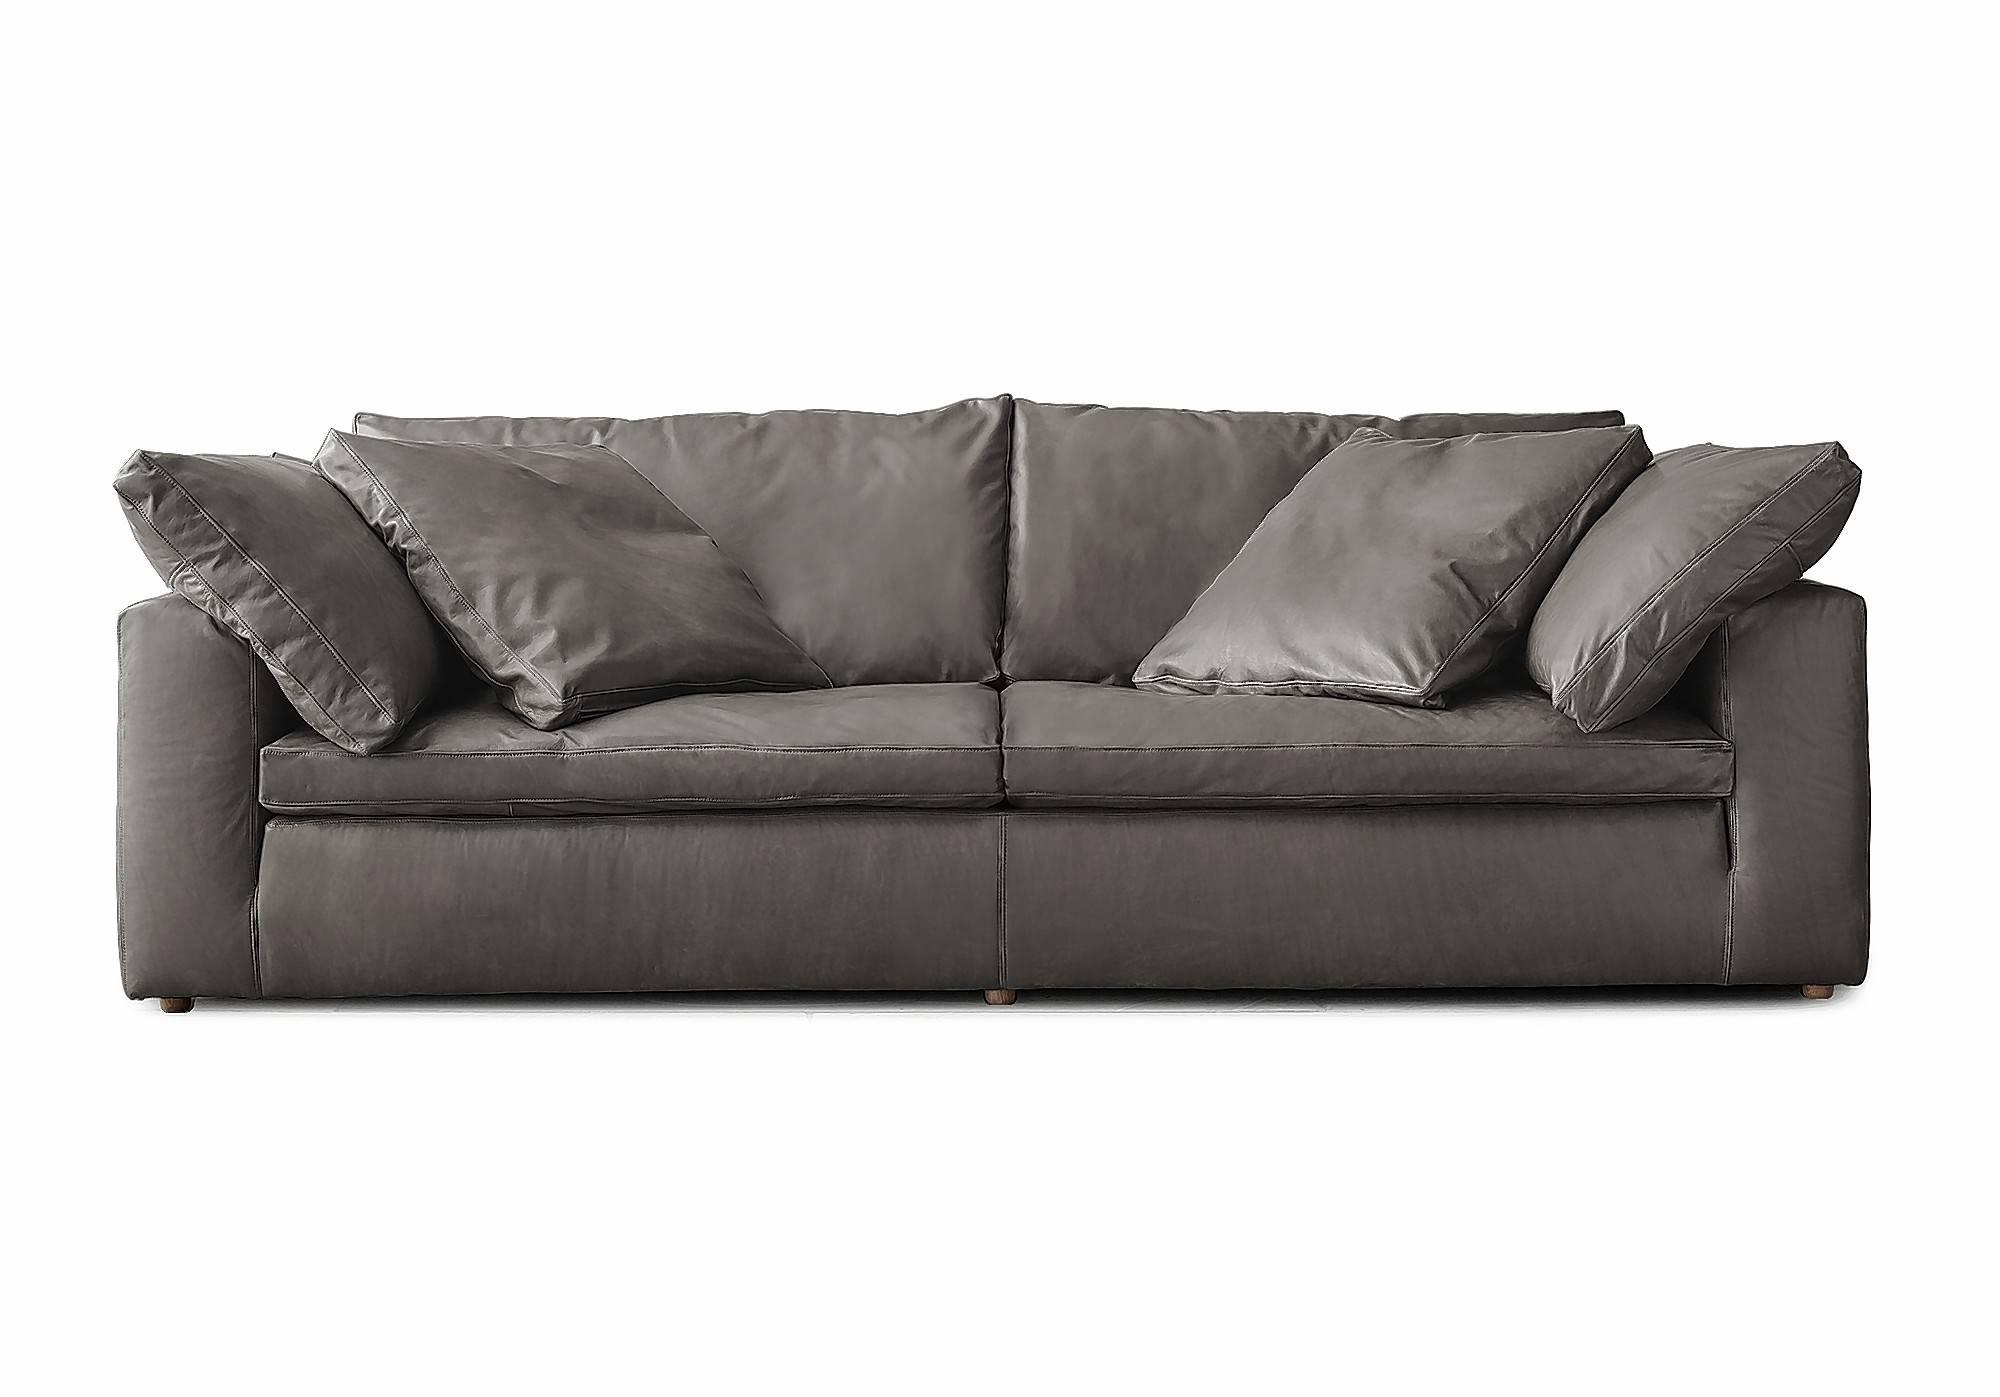 Craigslist Madison Wi Furniture Home Design Ideas And Pictures # Craigslist Muebles Waukesha Wi